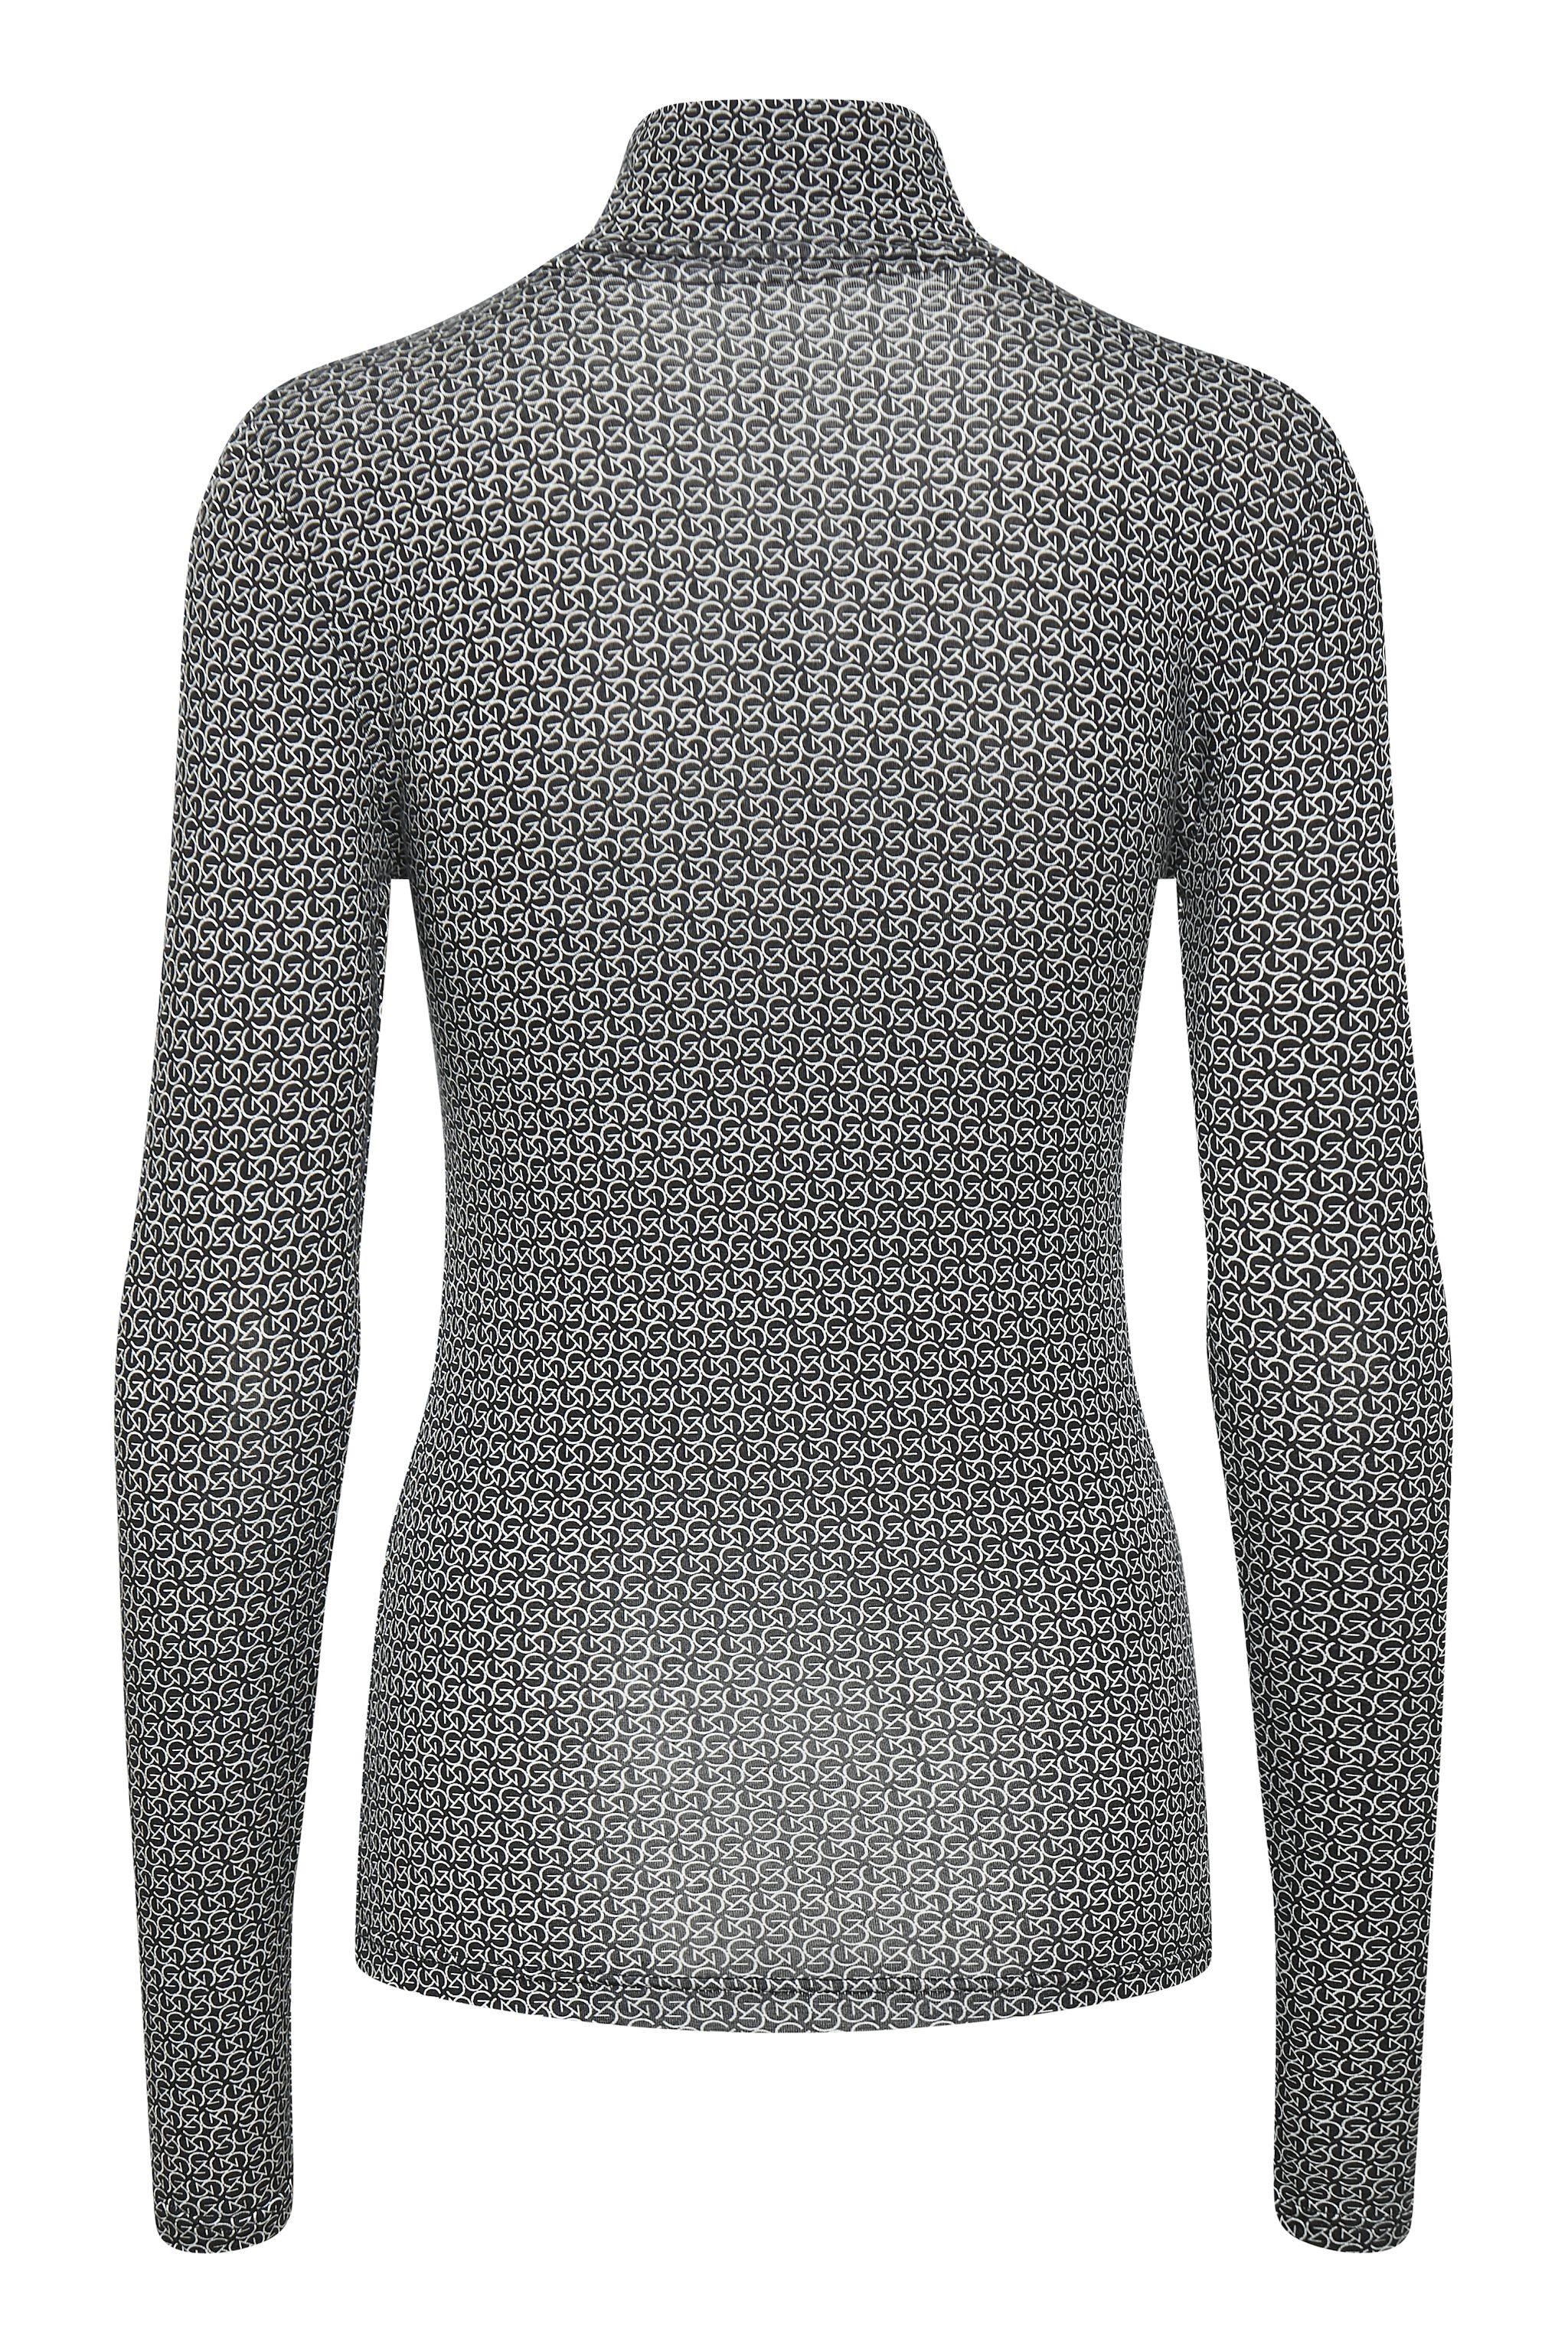 Gestuz SiriGZ langærmet t-shirt, Black Logo, L